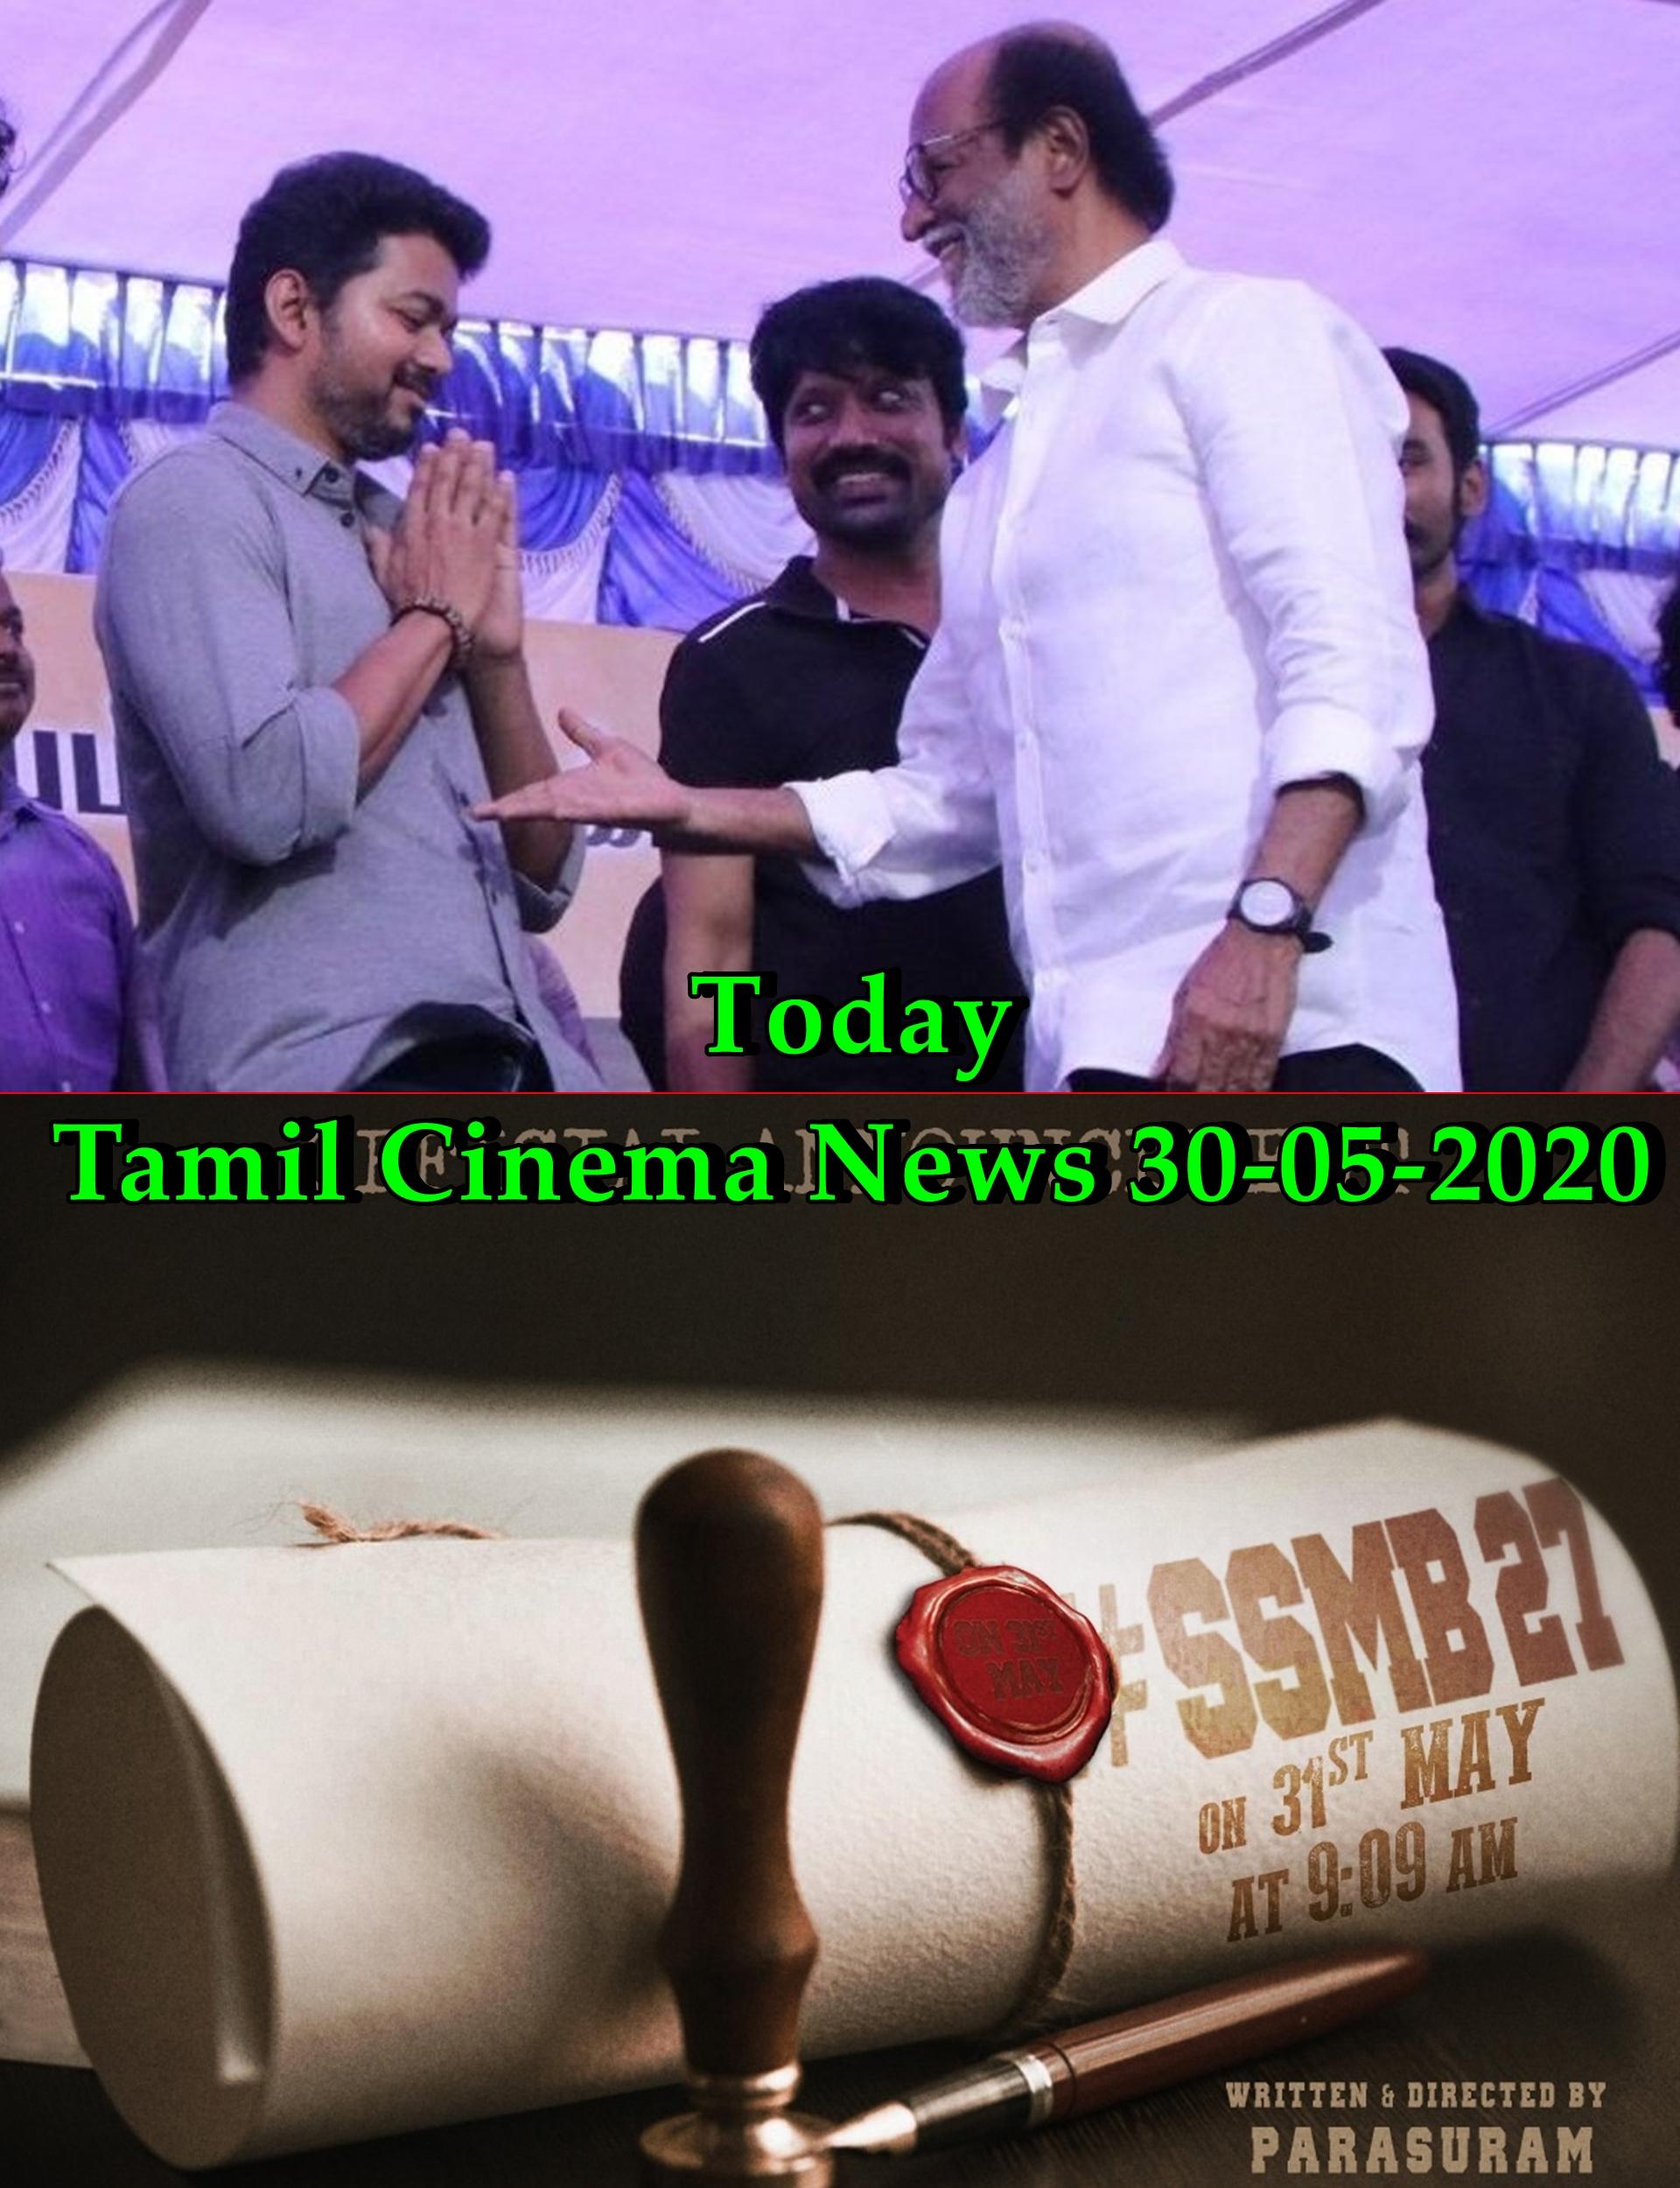 Today Tamil Cinema News 30-05-2020